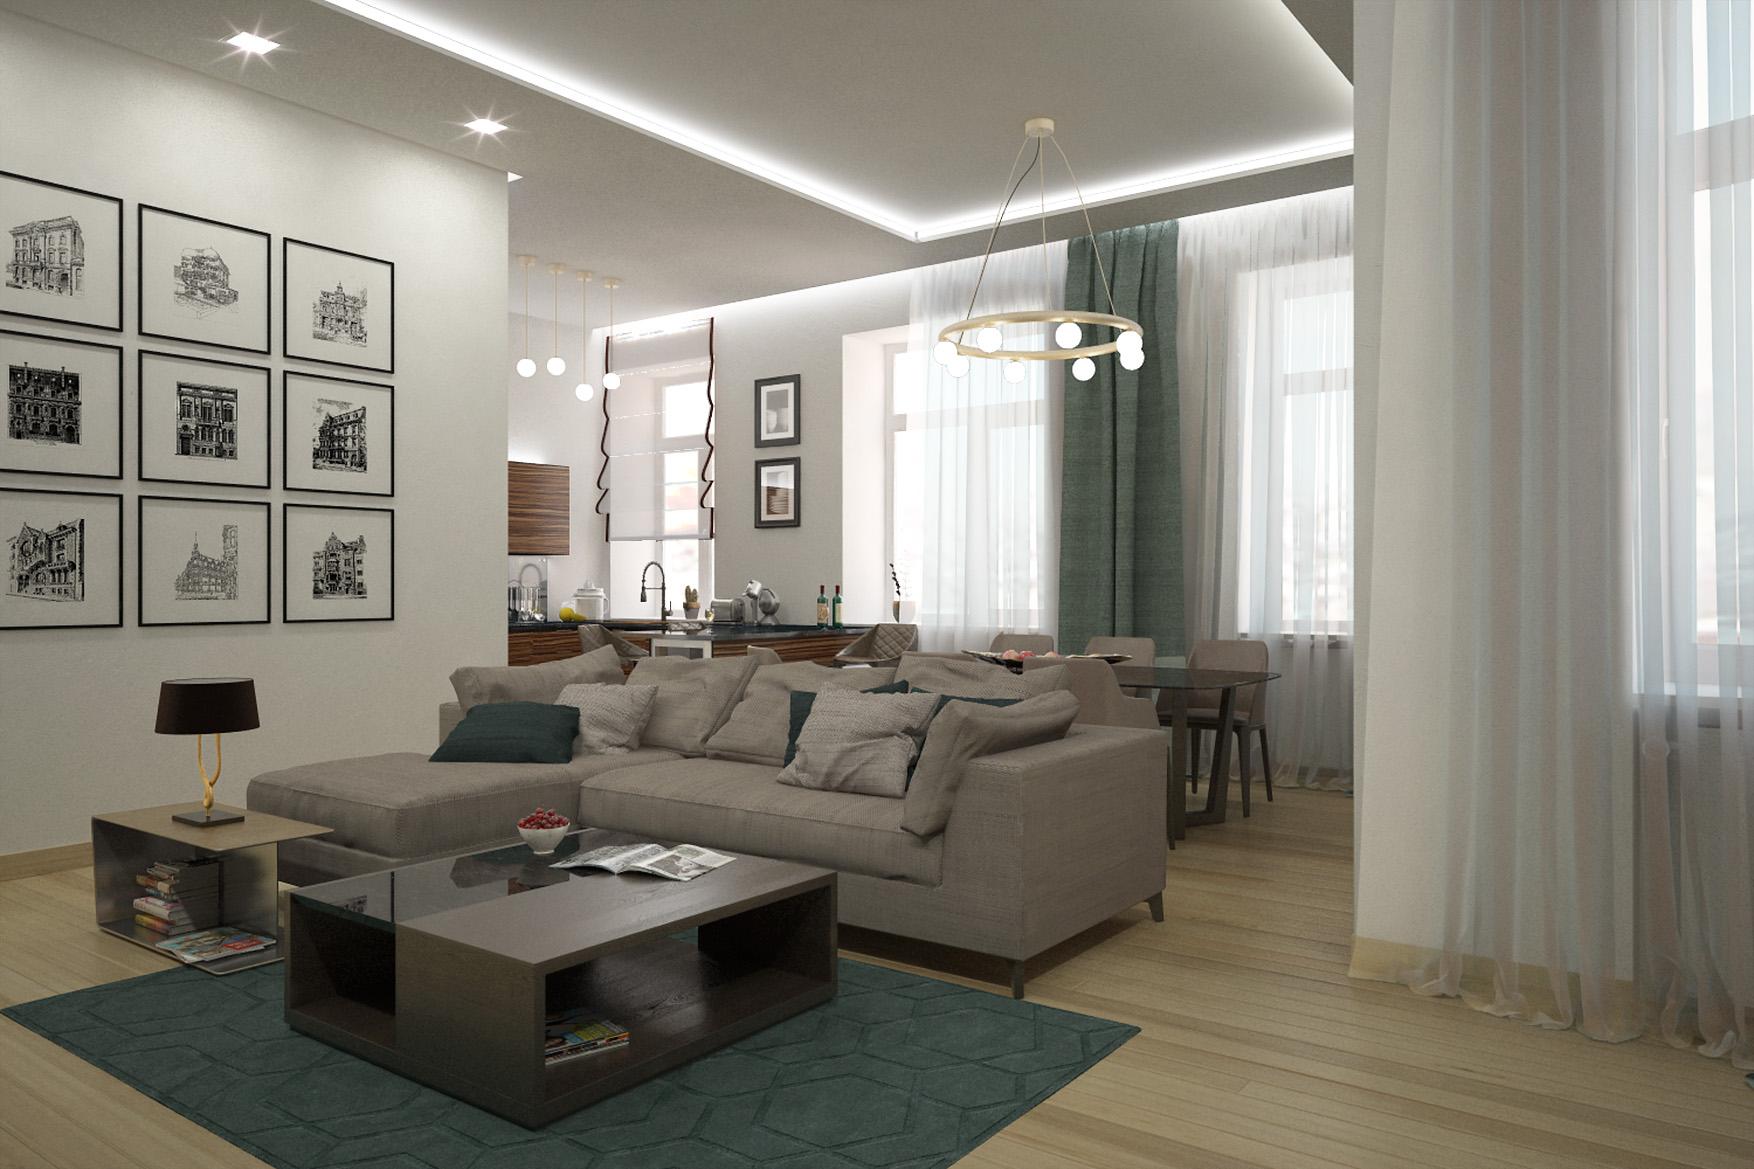 Дизайн интерьера квартиры, ул. Сретенка, Москва, гостиная